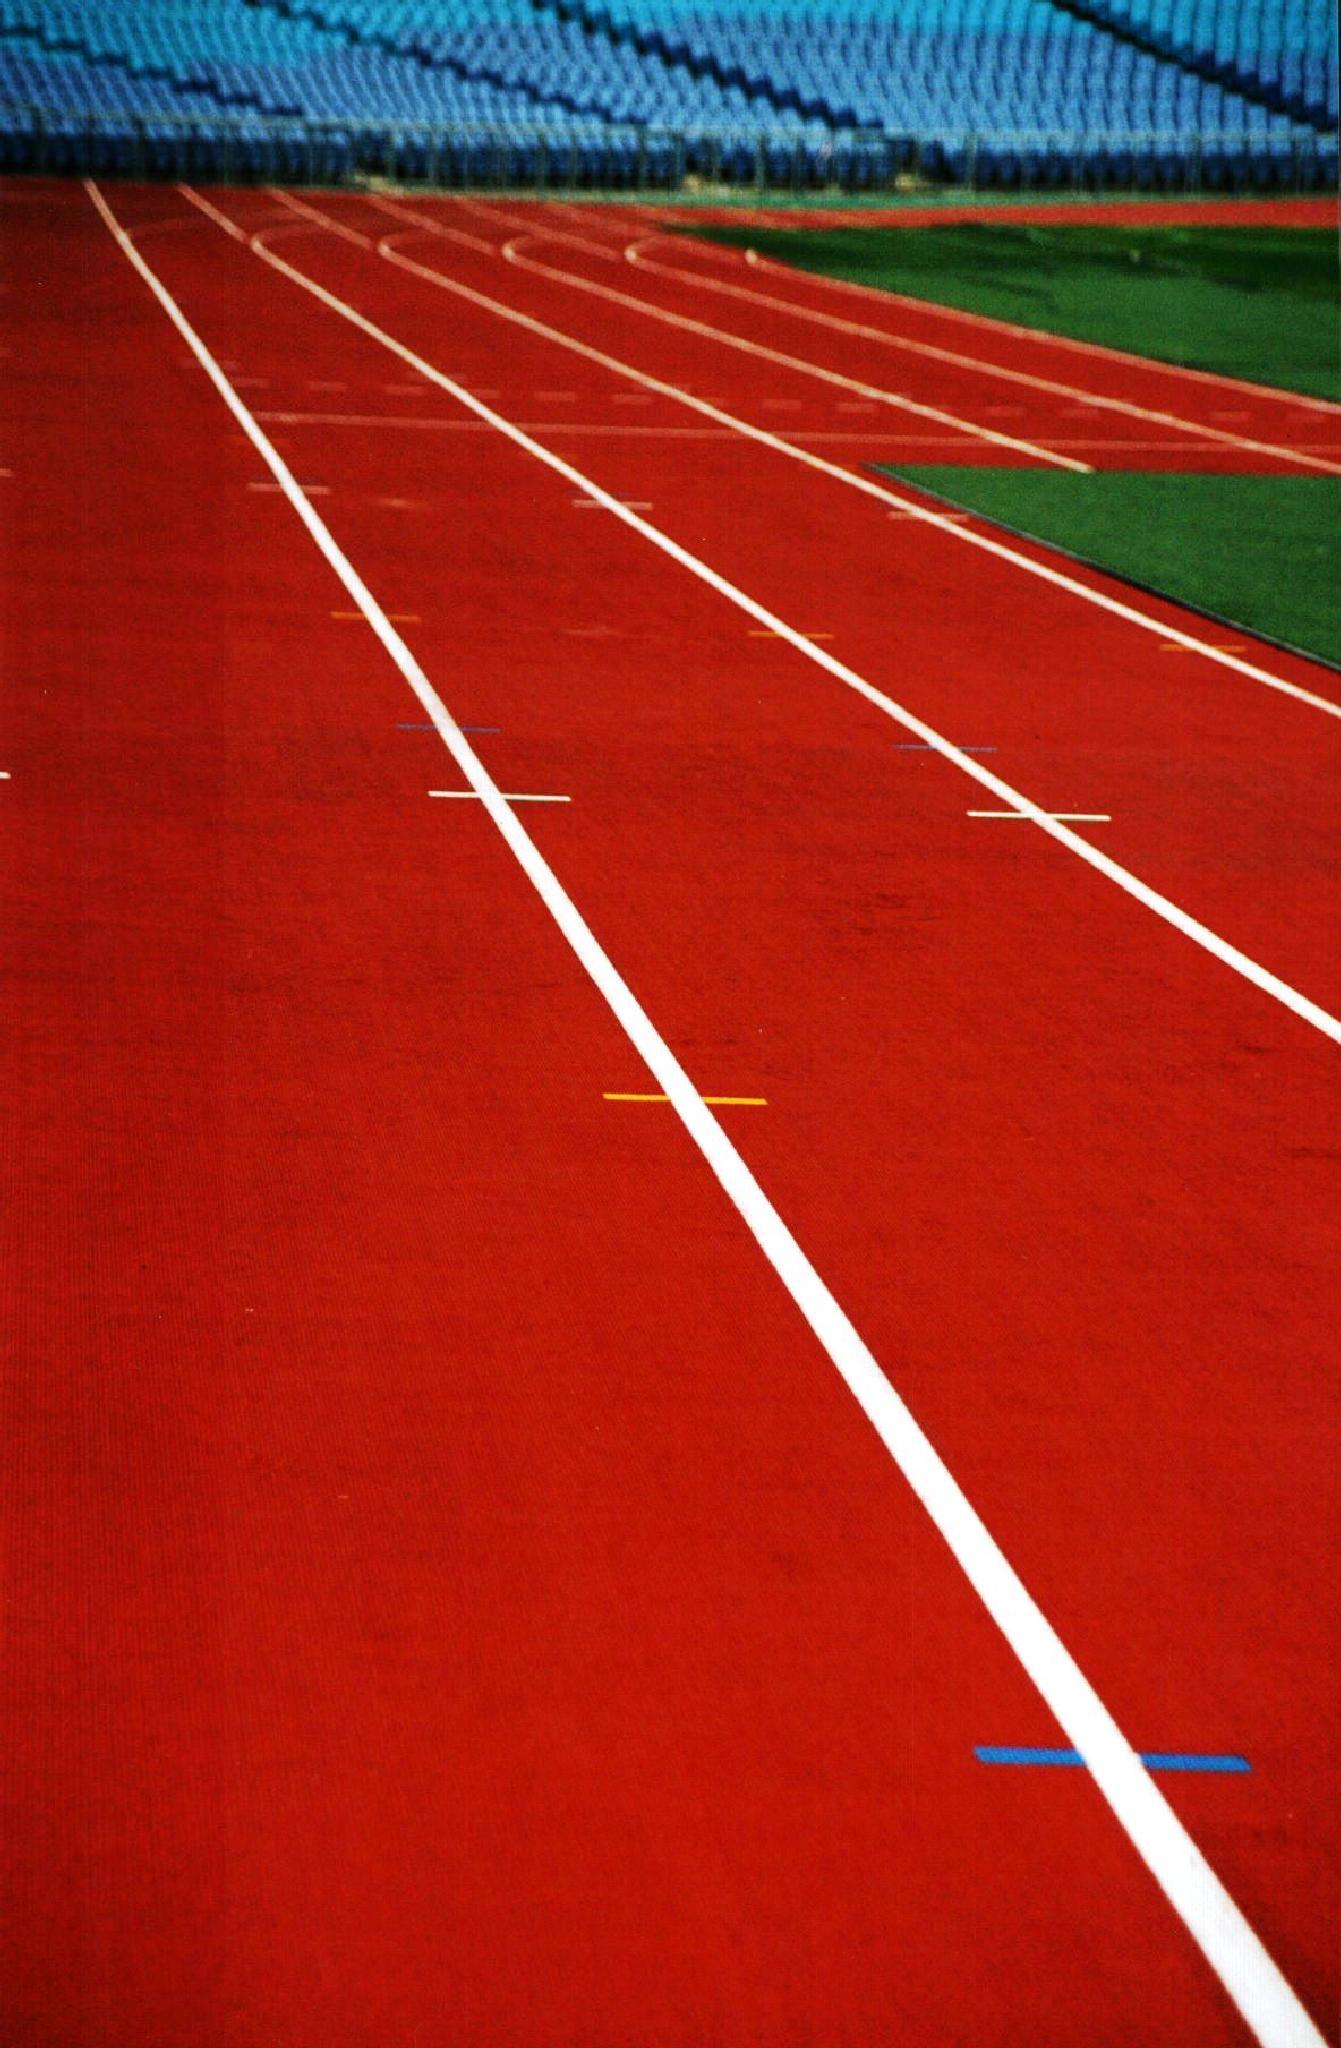 racetrack - Sydney Olympic Stadium by cinzia.sawatzky